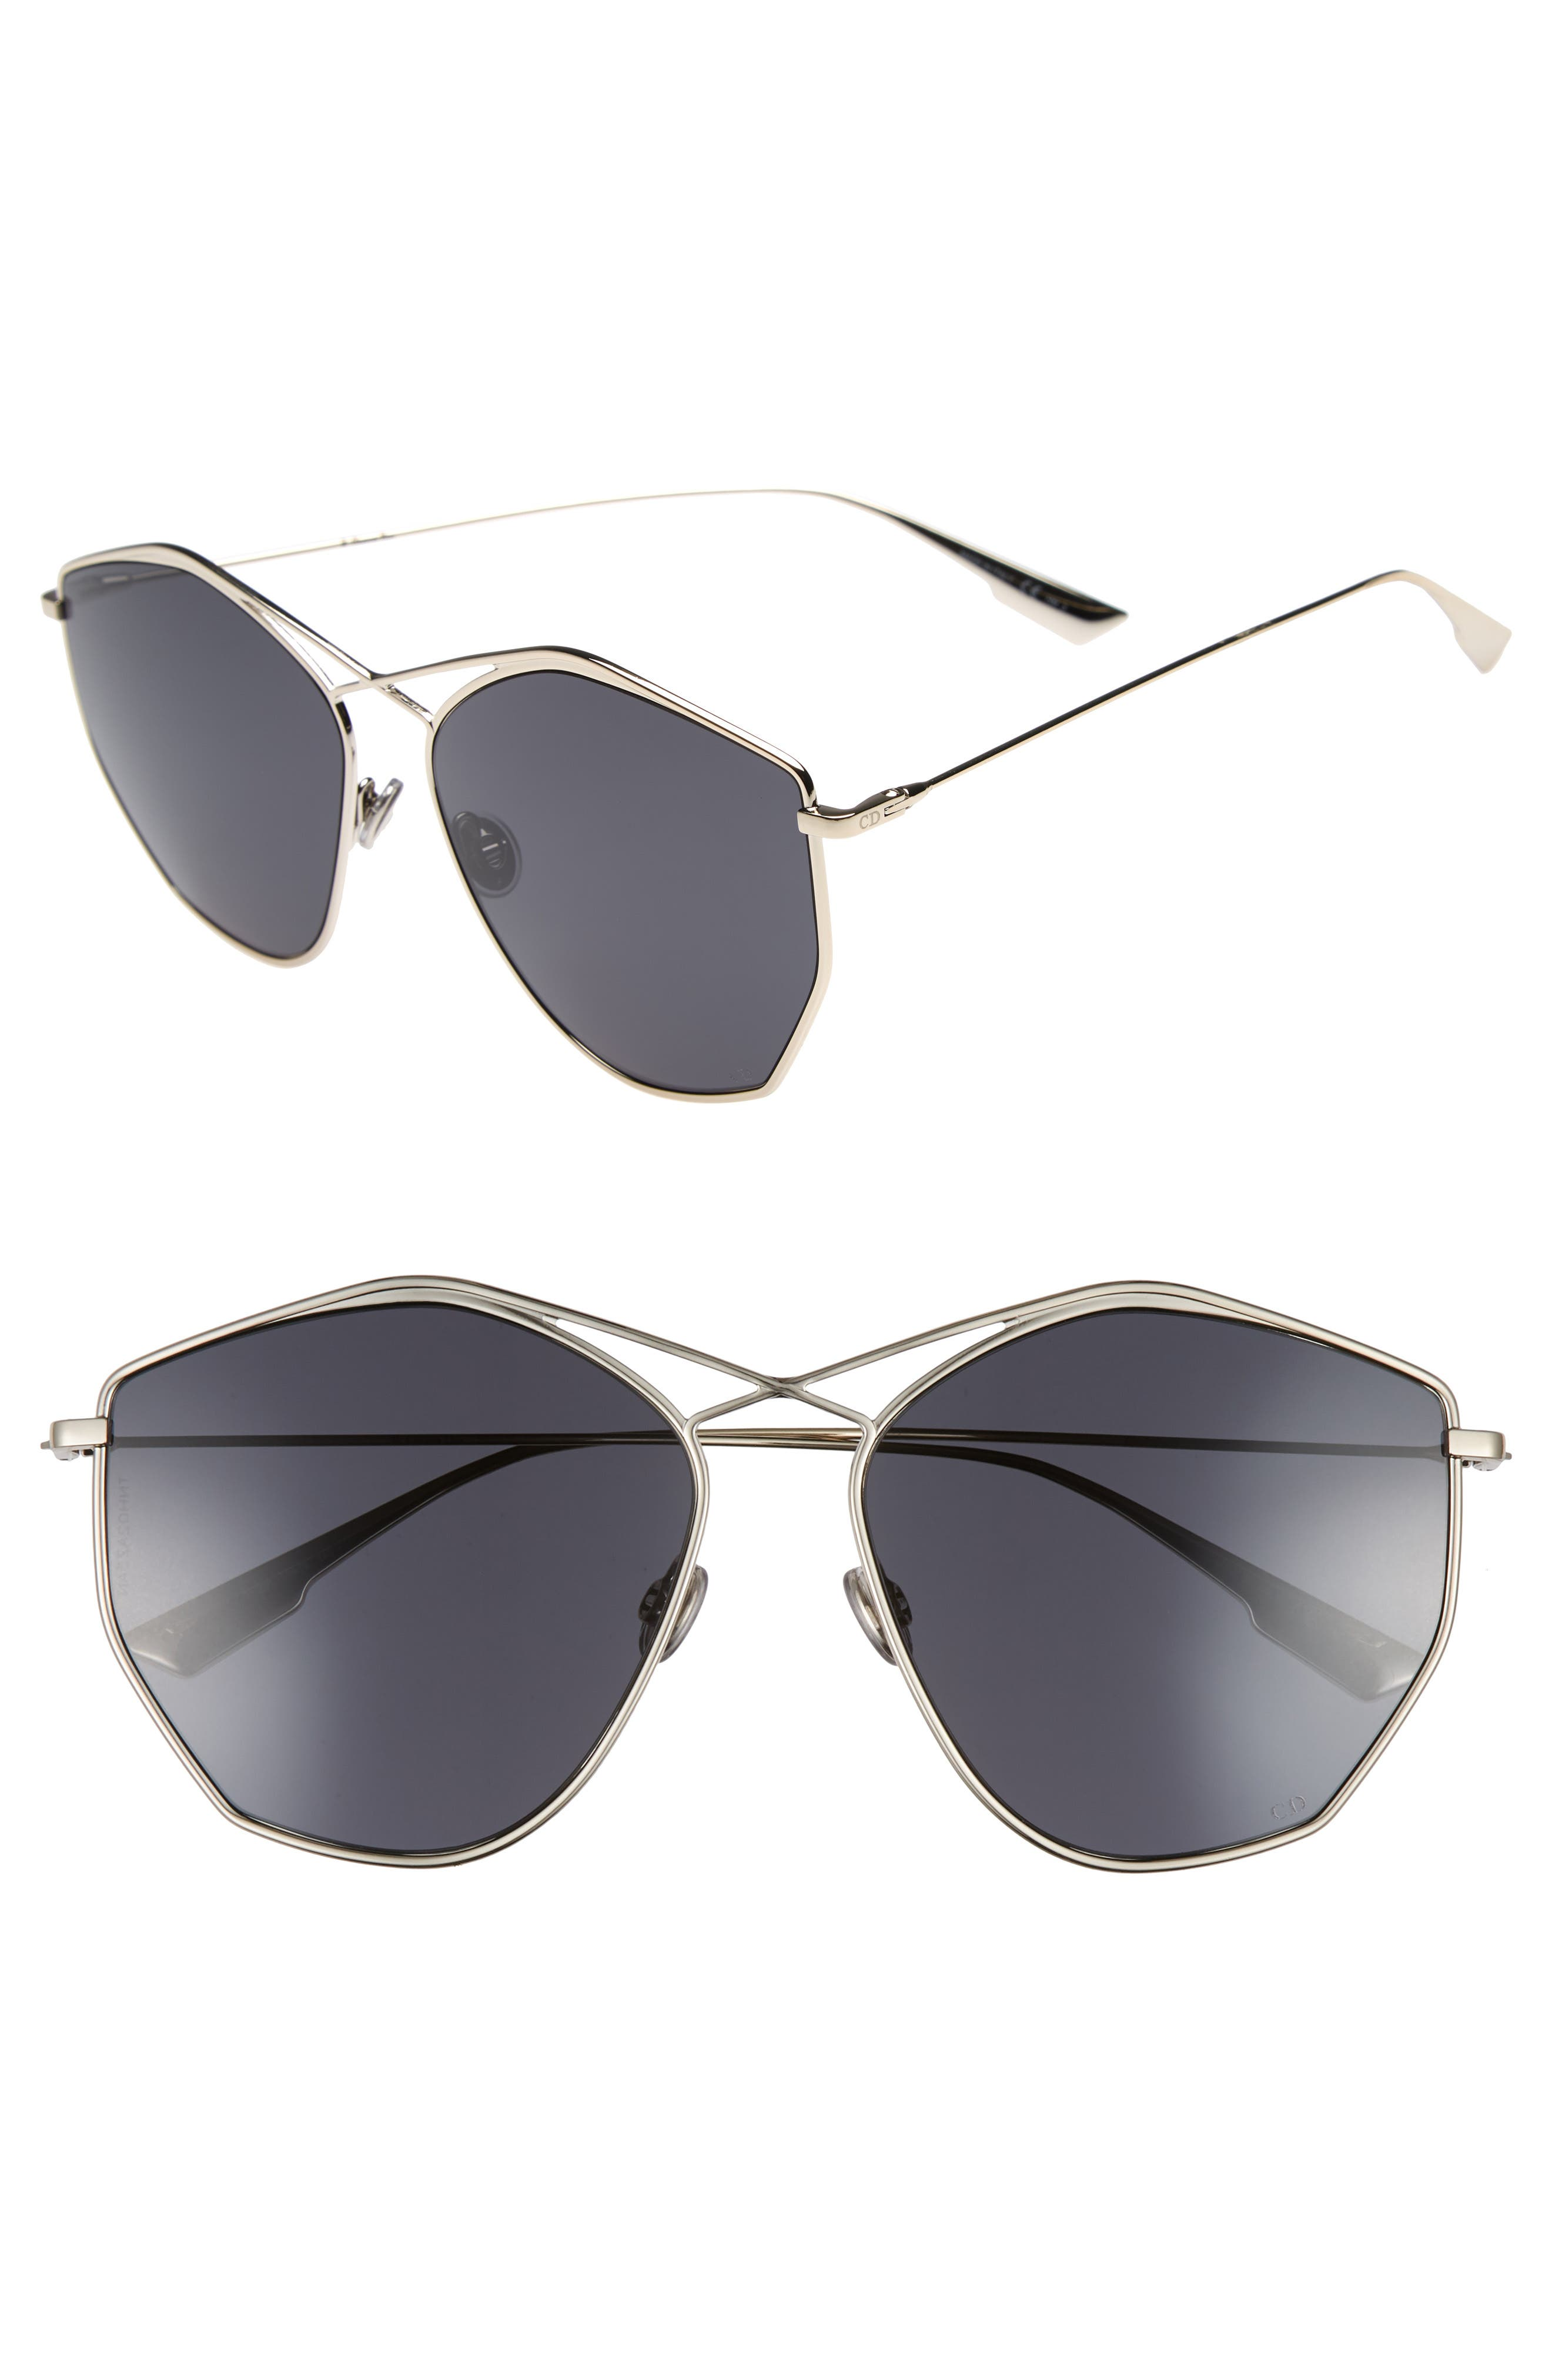 59mm Metal Sunglasses,                             Main thumbnail 1, color,                             LIGHT GOLD